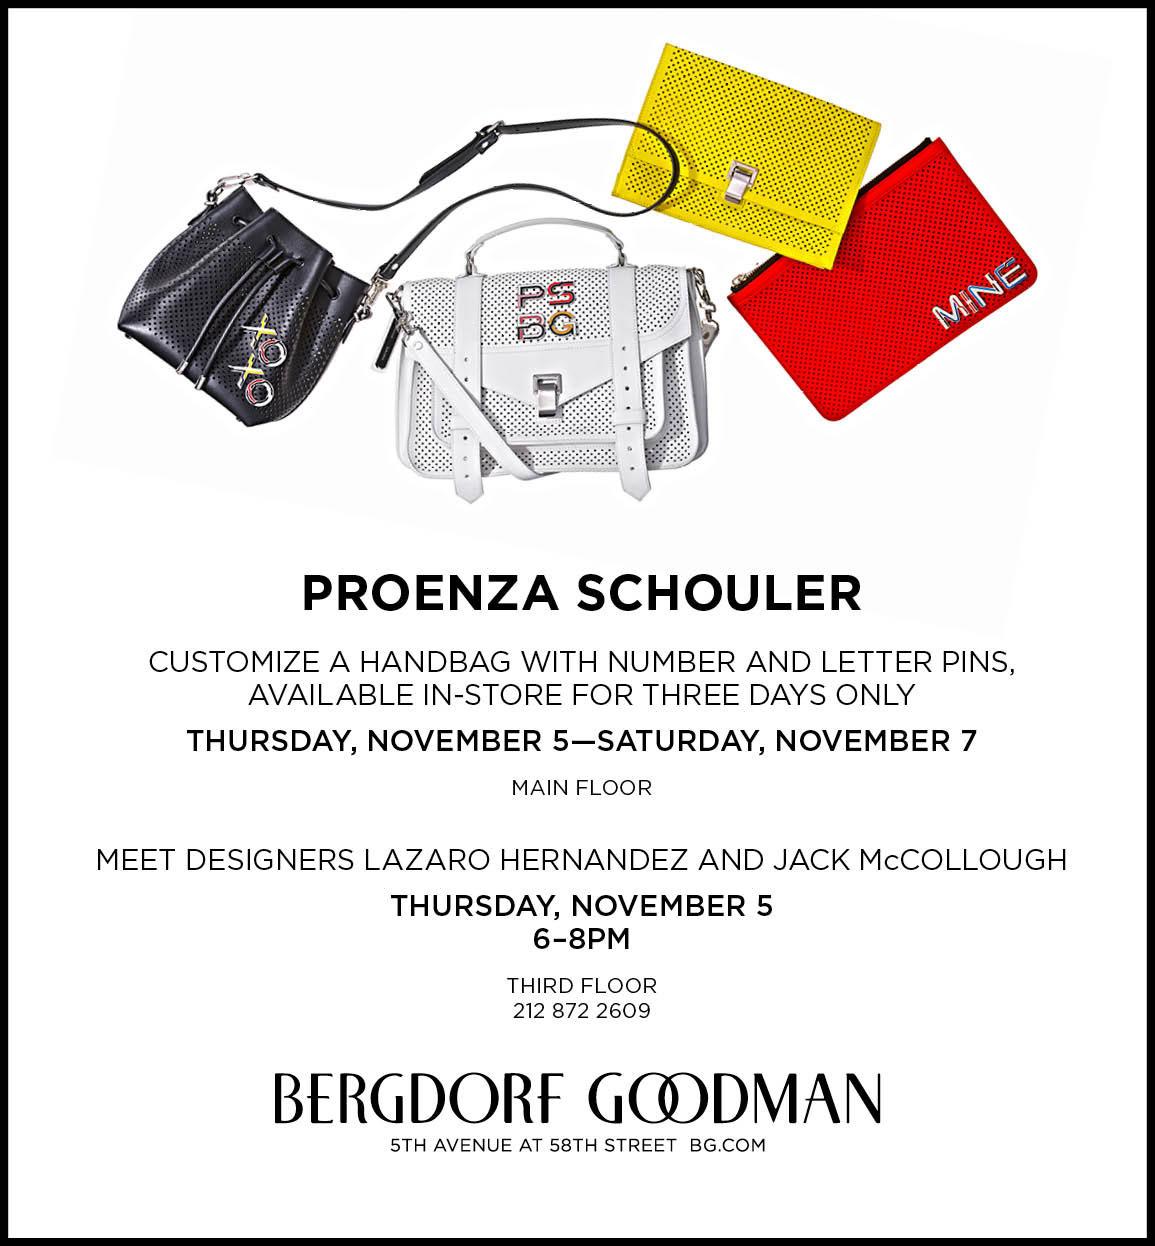 Proenza Schouler Handbag Customization Event